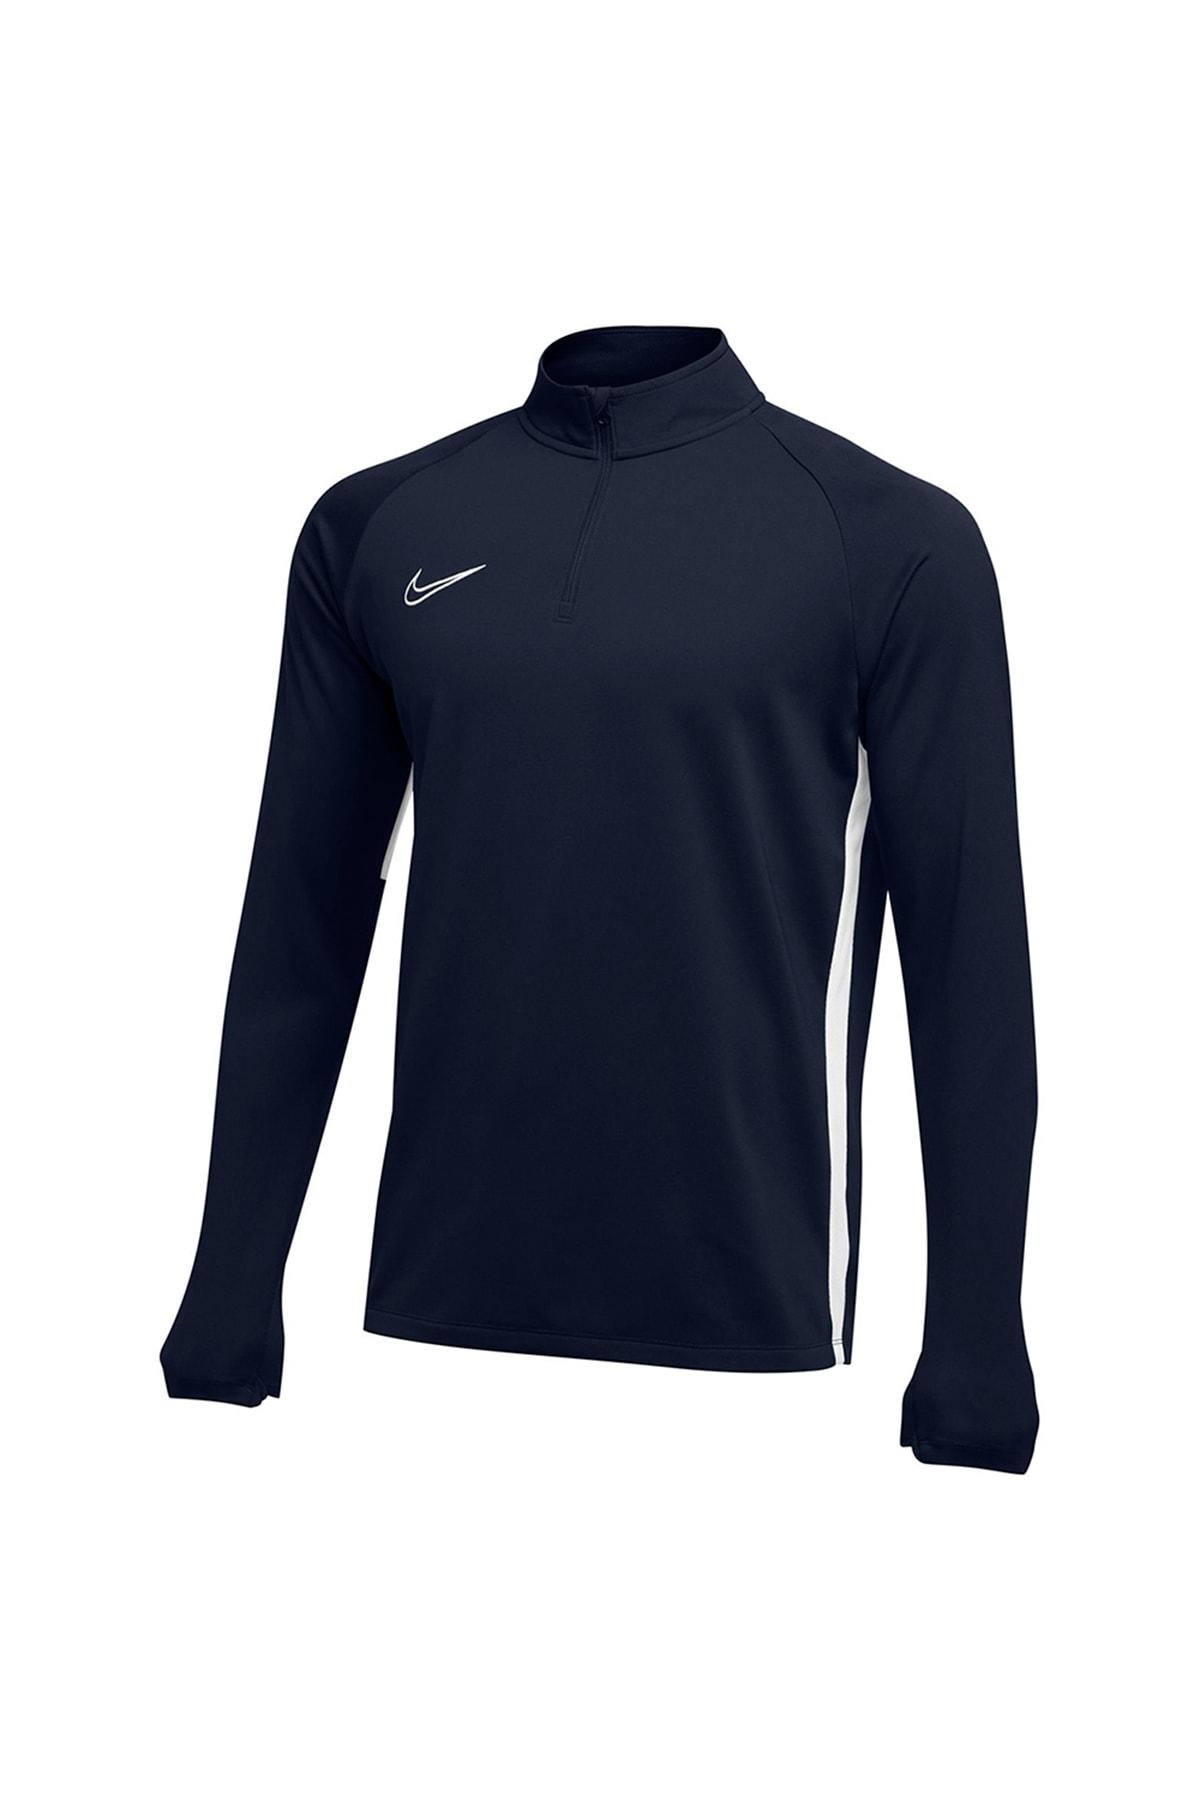 Nike AJ9094-451 M NK DRY ACDMY19 DRIL TOP Erkek T-Shirt 1